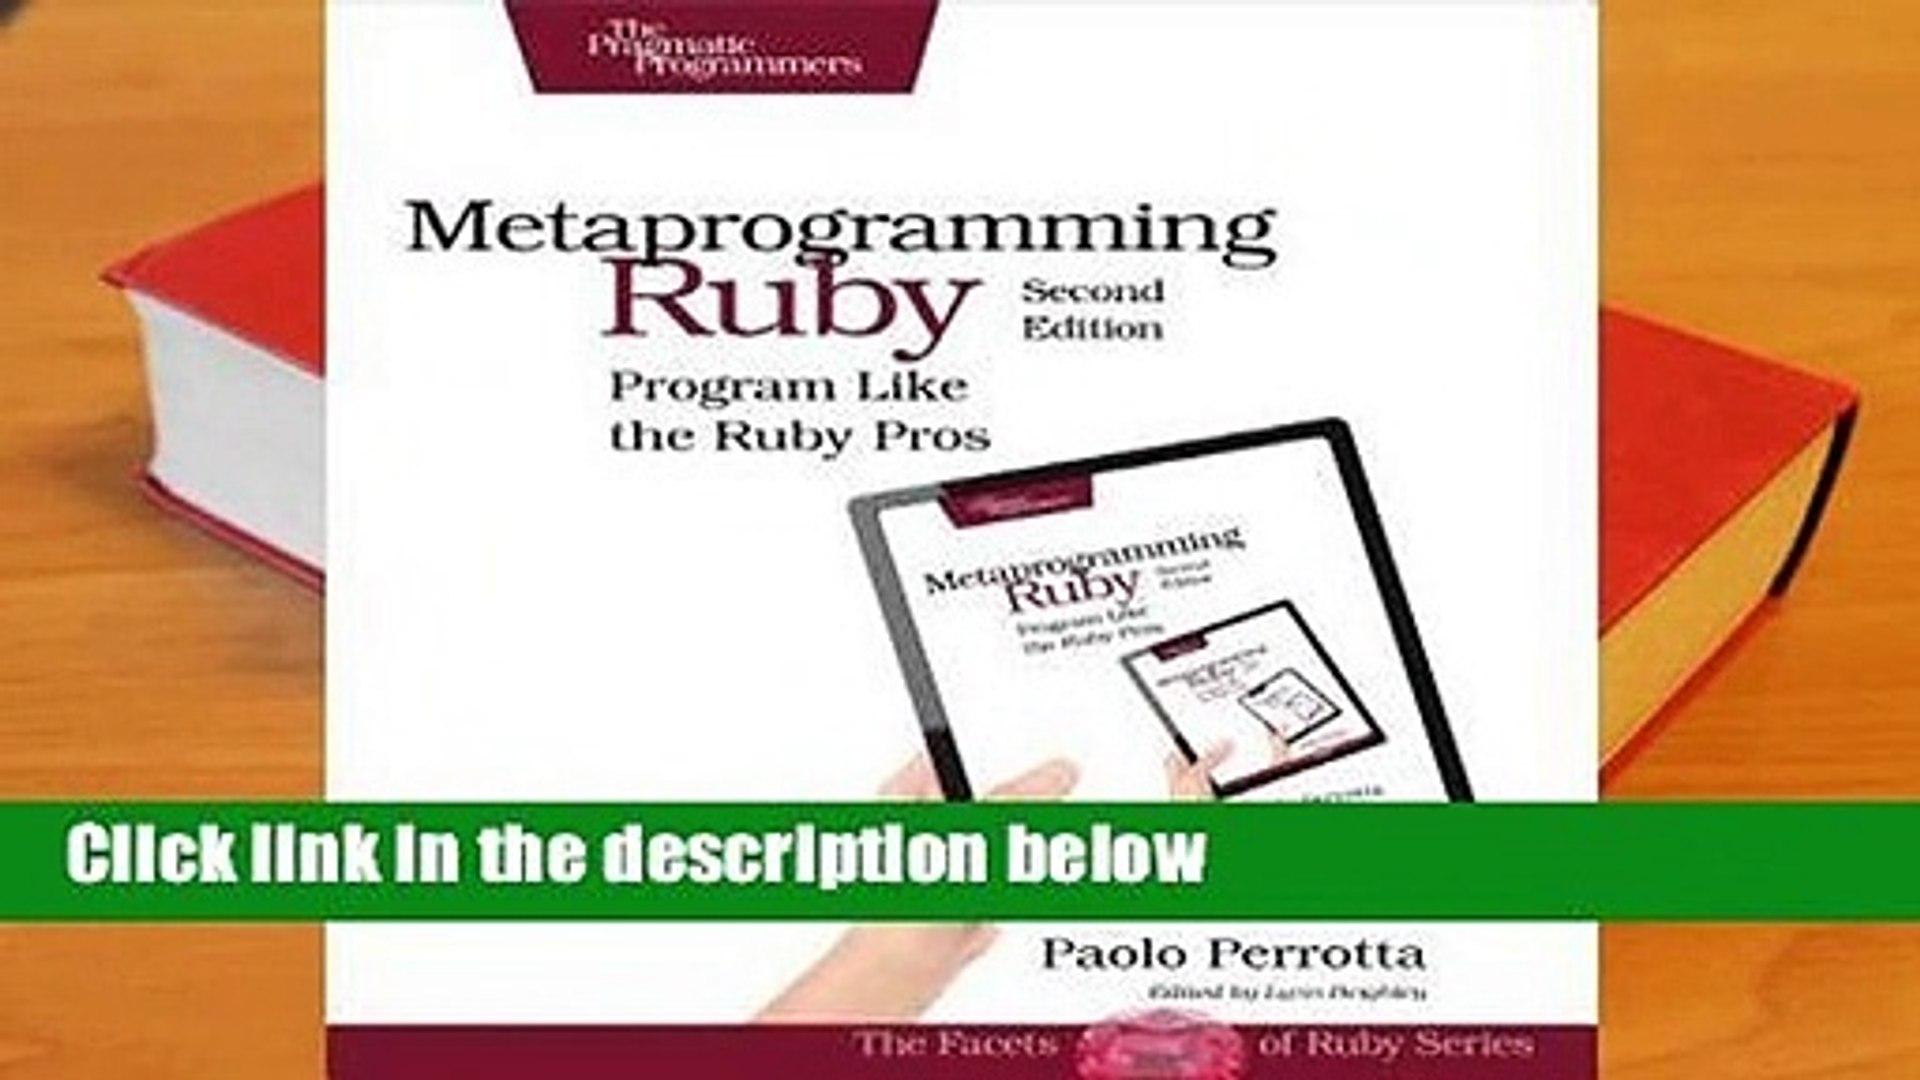 Metaprogramming Ruby: Program Like the Ruby Pros